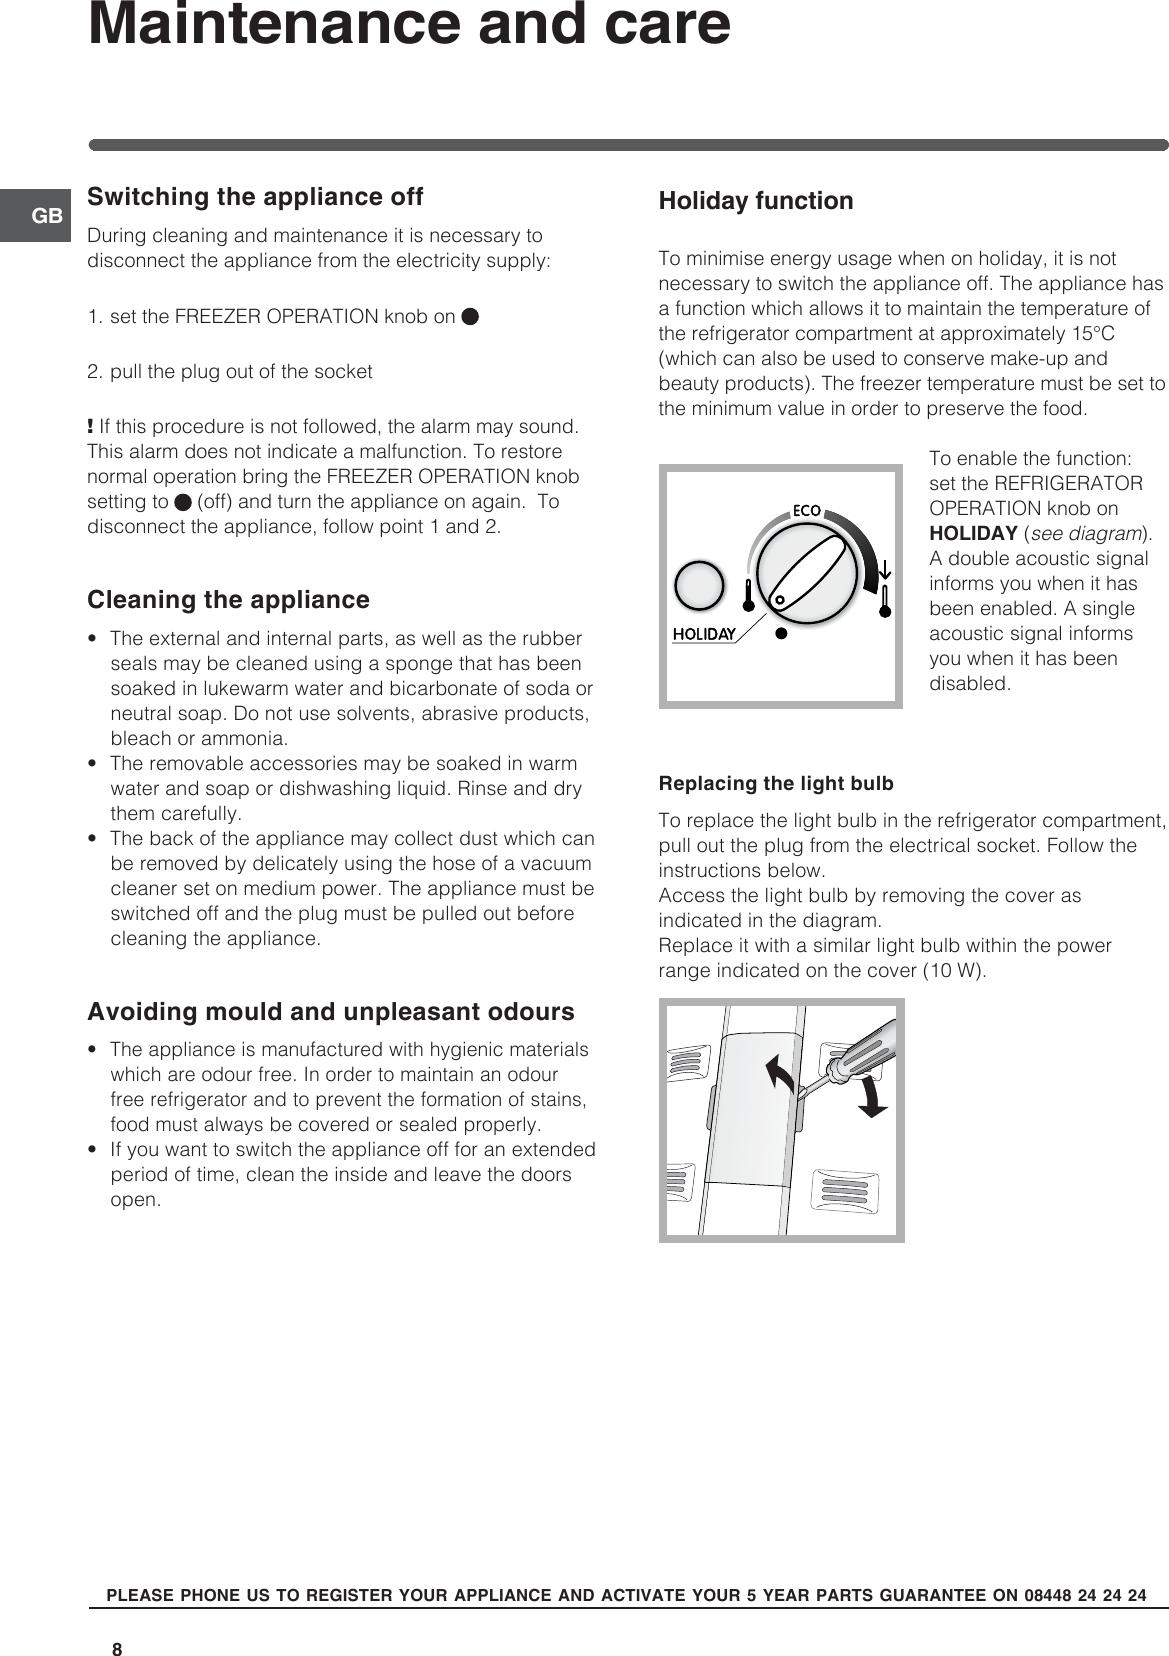 Indesit Refrigerator Taan 6 Fnf Si Users Manual Tr8172gb_Doppia Porta 180504UserManual.wiki